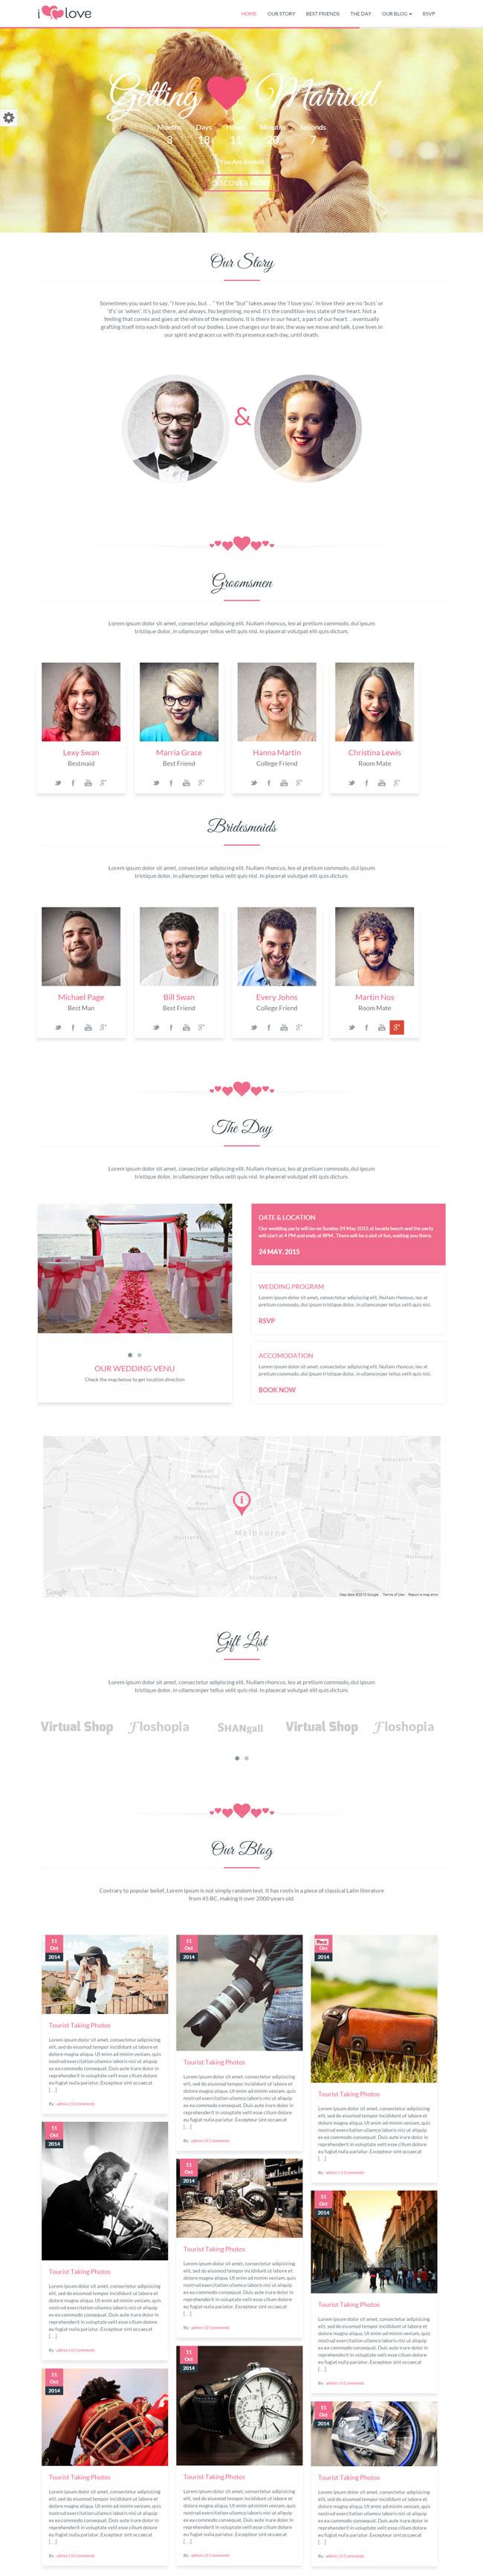 iLove-Responsive-Wedding-Event-WordPress-Theme